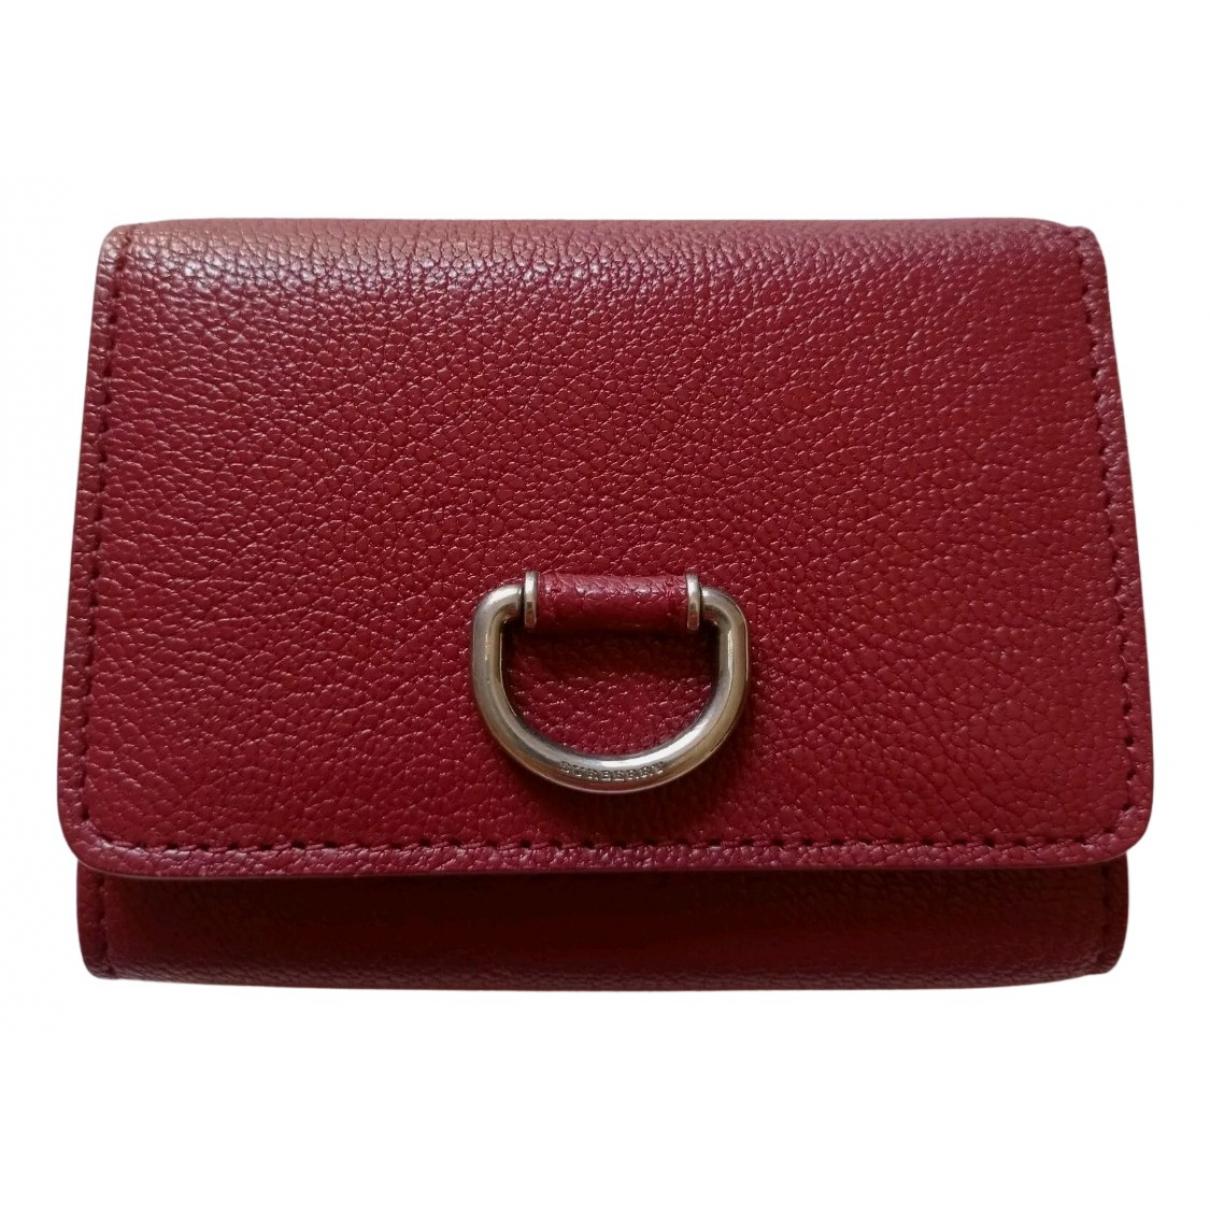 Burberry N Burgundy Leather wallet for Women N